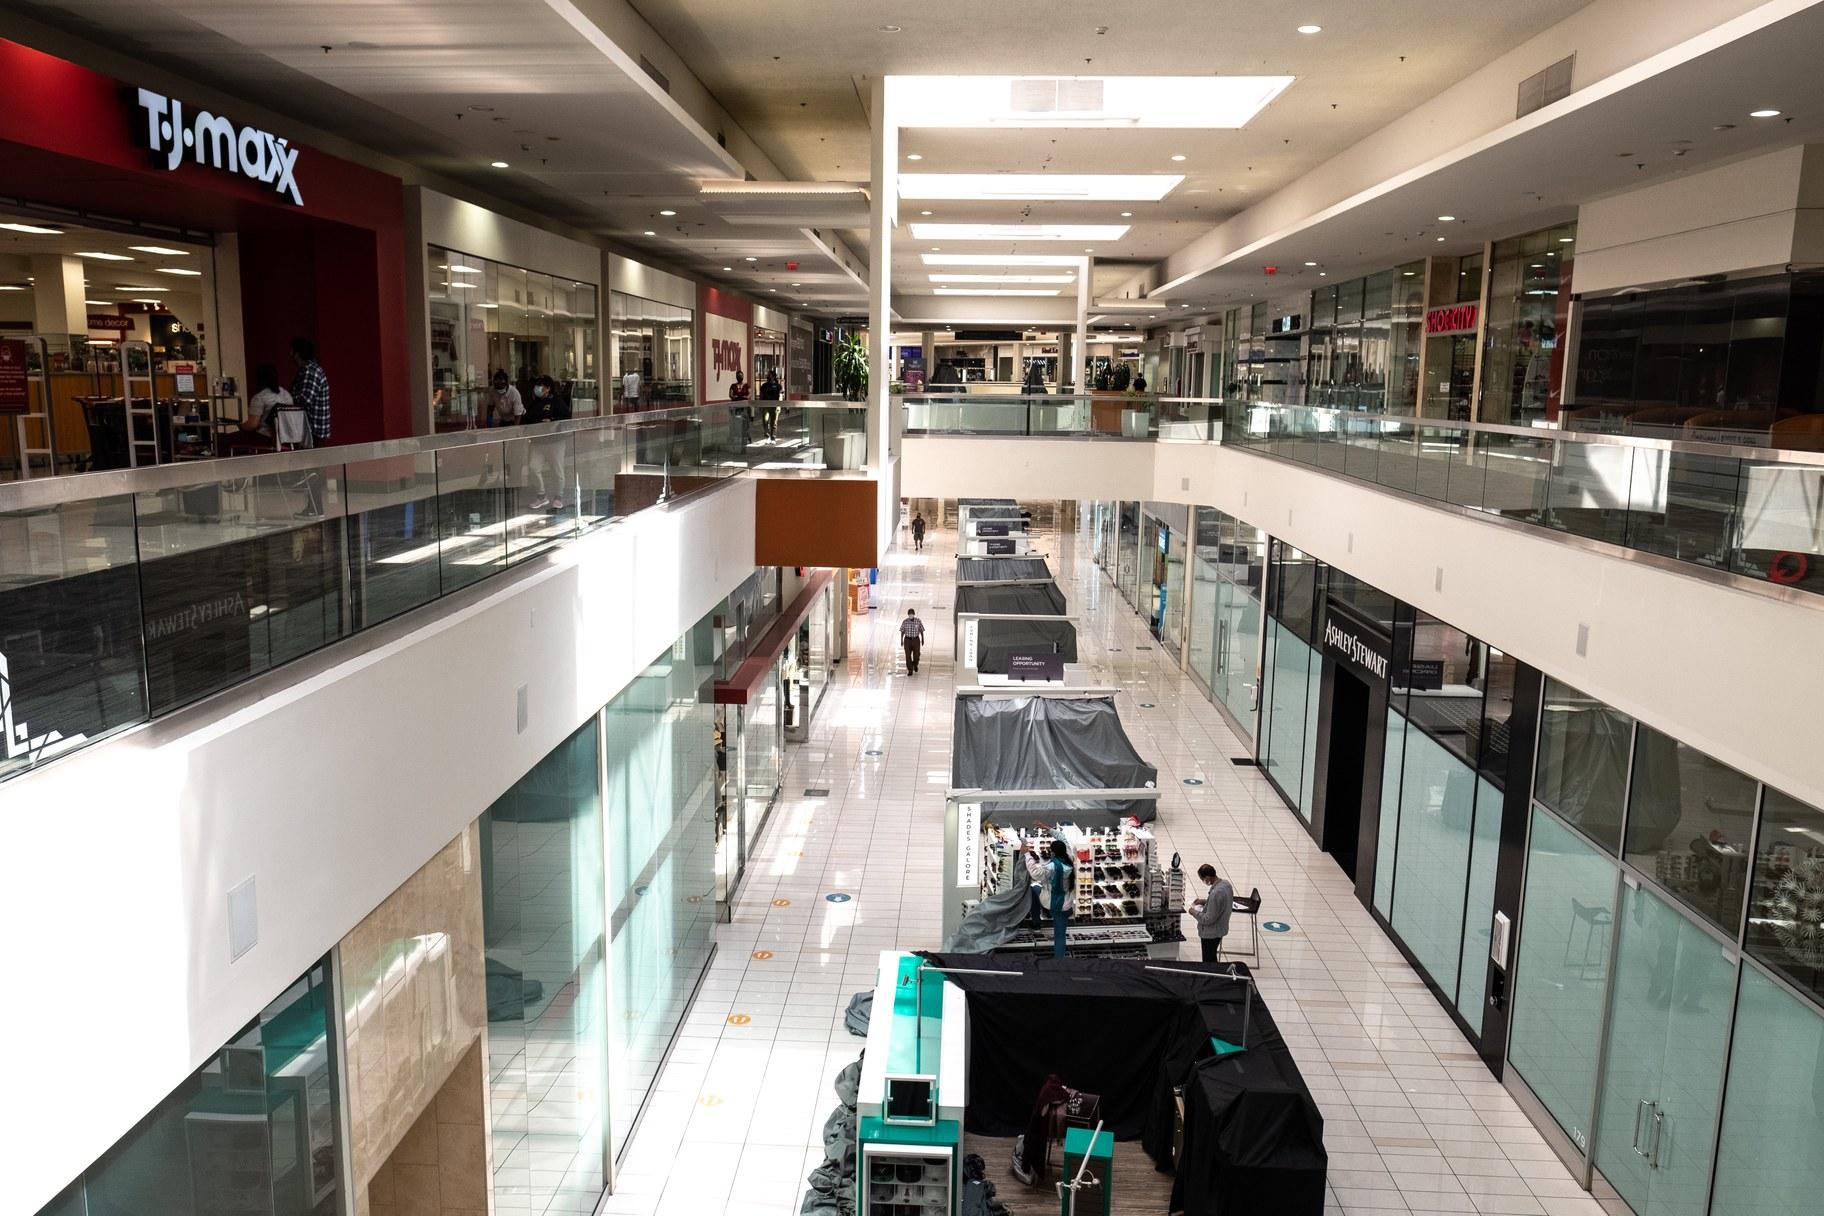 Baldwin Hills Crenshaw Mall-May 3 2021-Amy Ta-1.jpg